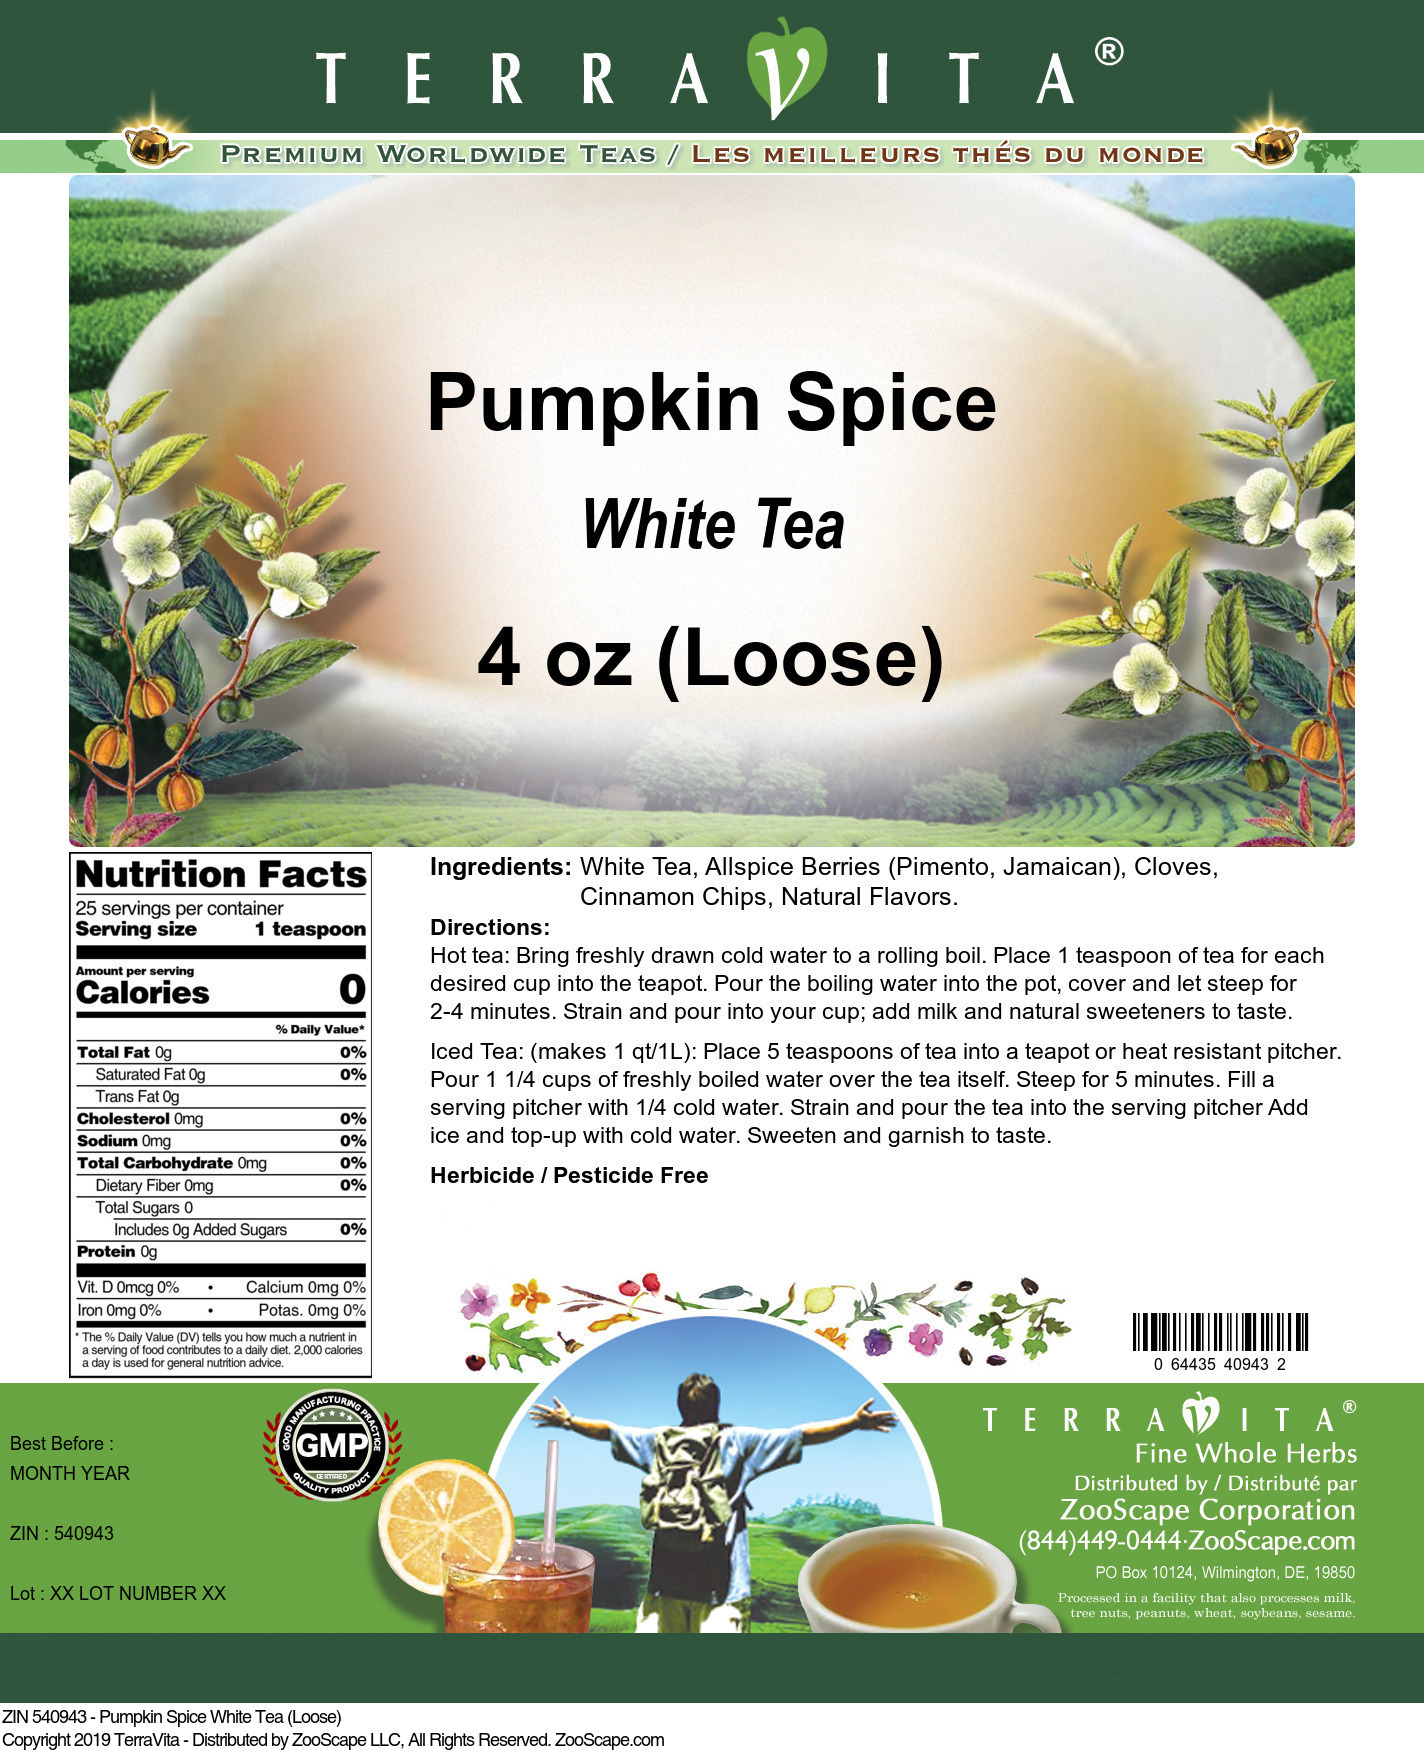 Pumpkin Spice White Tea